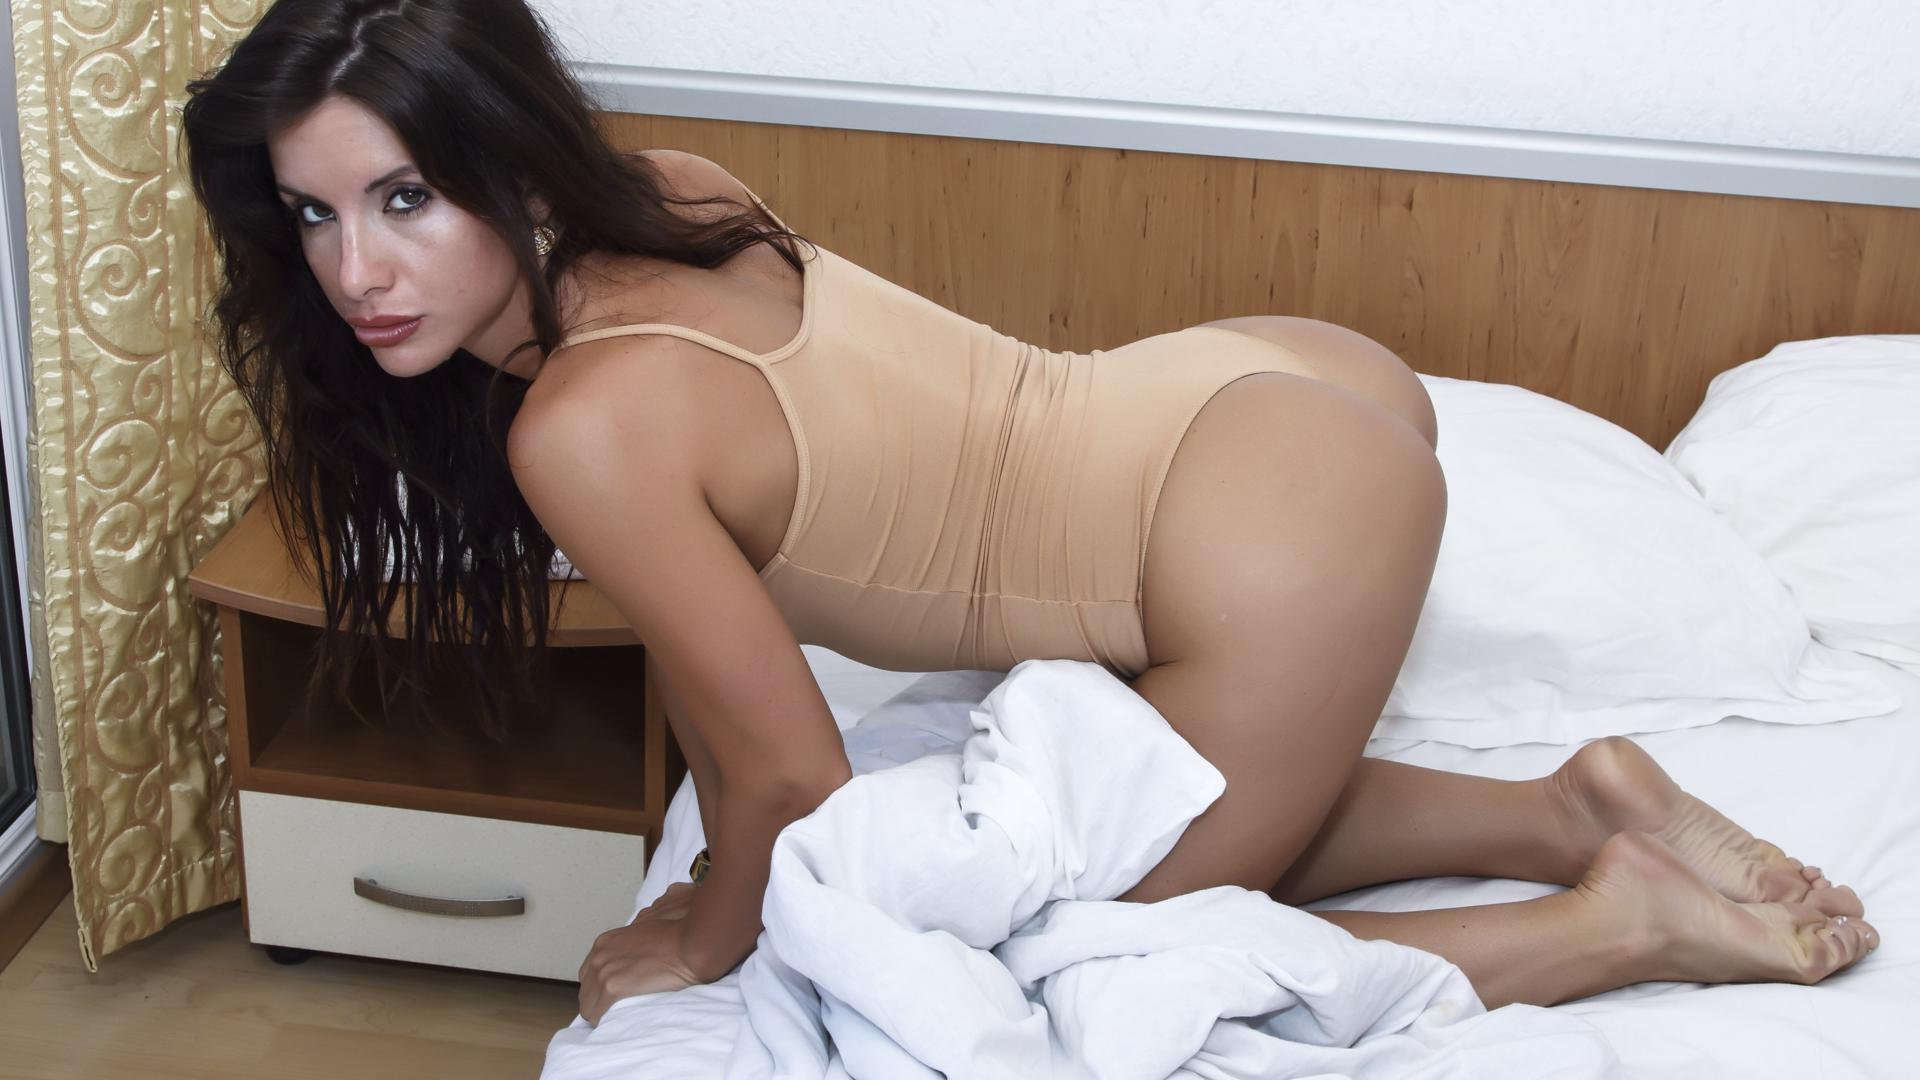 download photo 1920x1080 maple lane bru te sexy girl